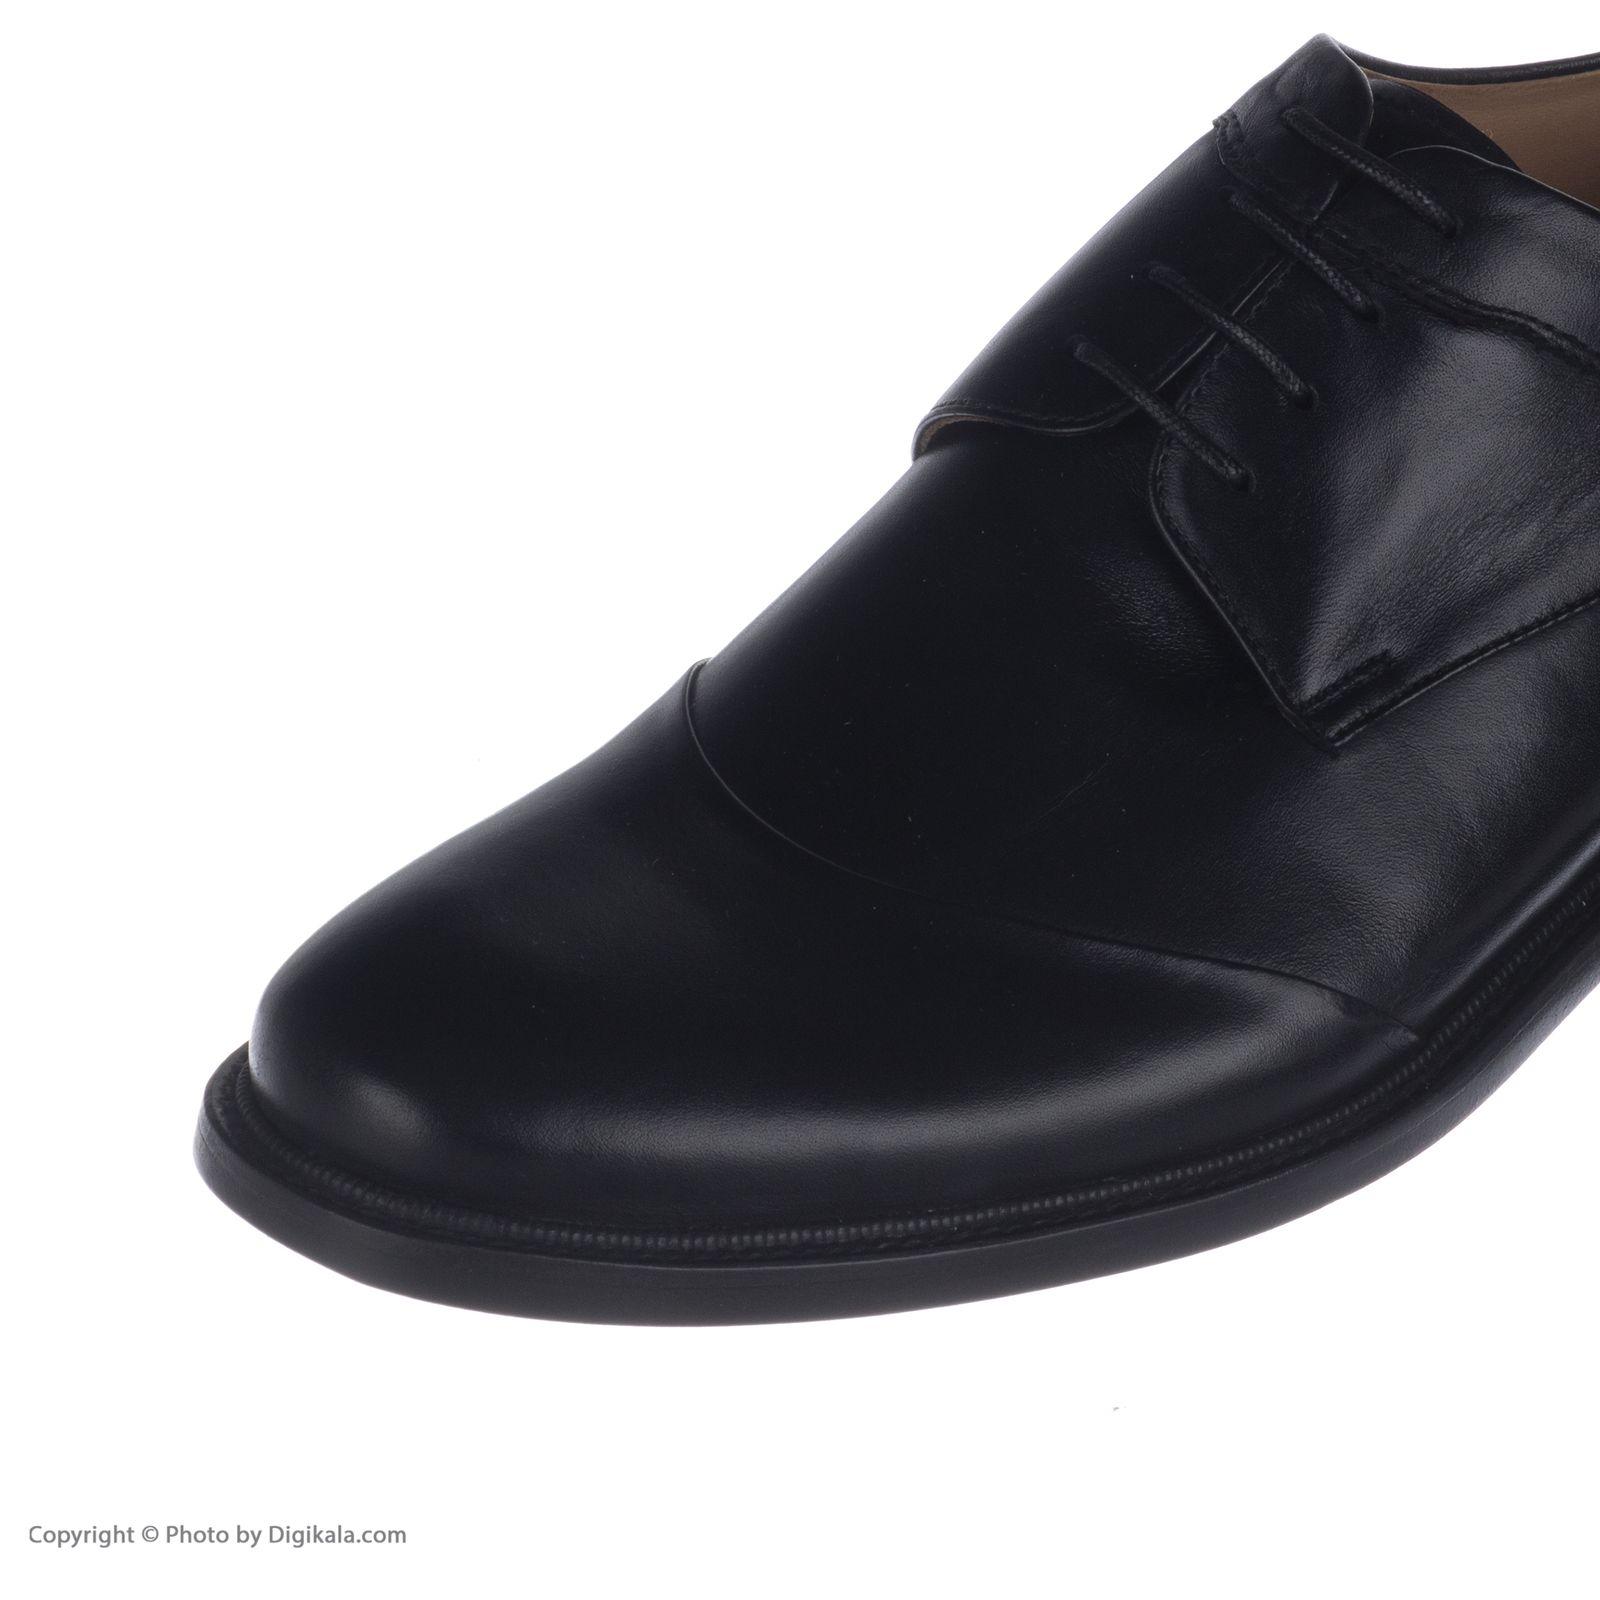 کفش مردانه نظری کد 423 -  - 6